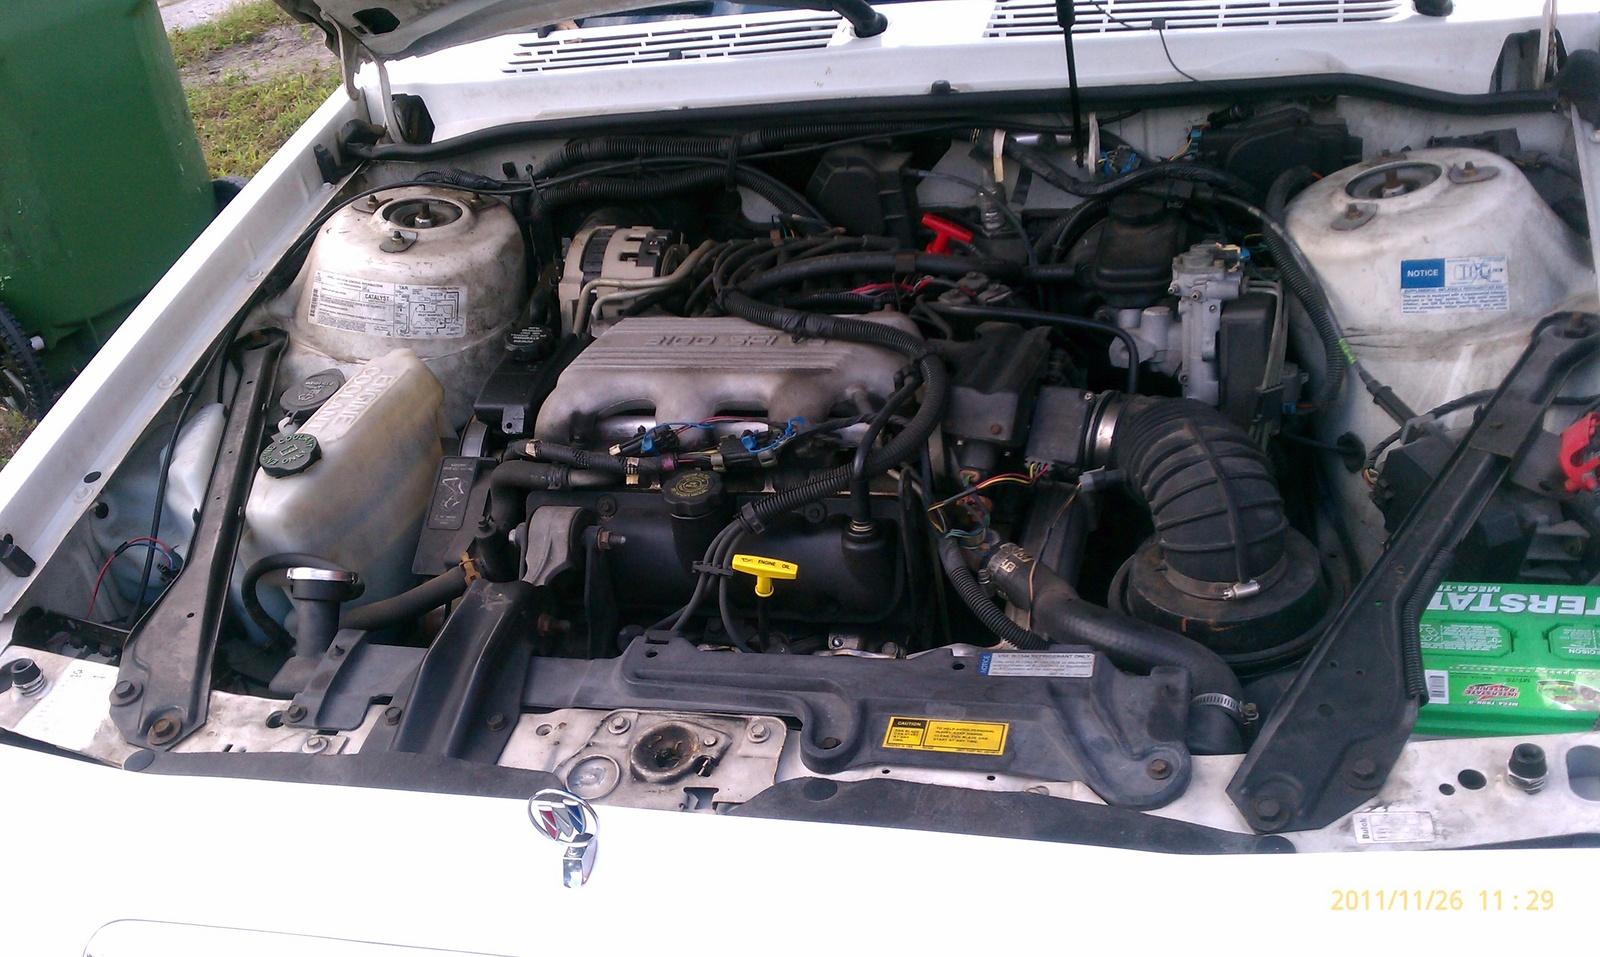 1990 Buick Century Problems 1 - - 1990 Buick Century Problems 1